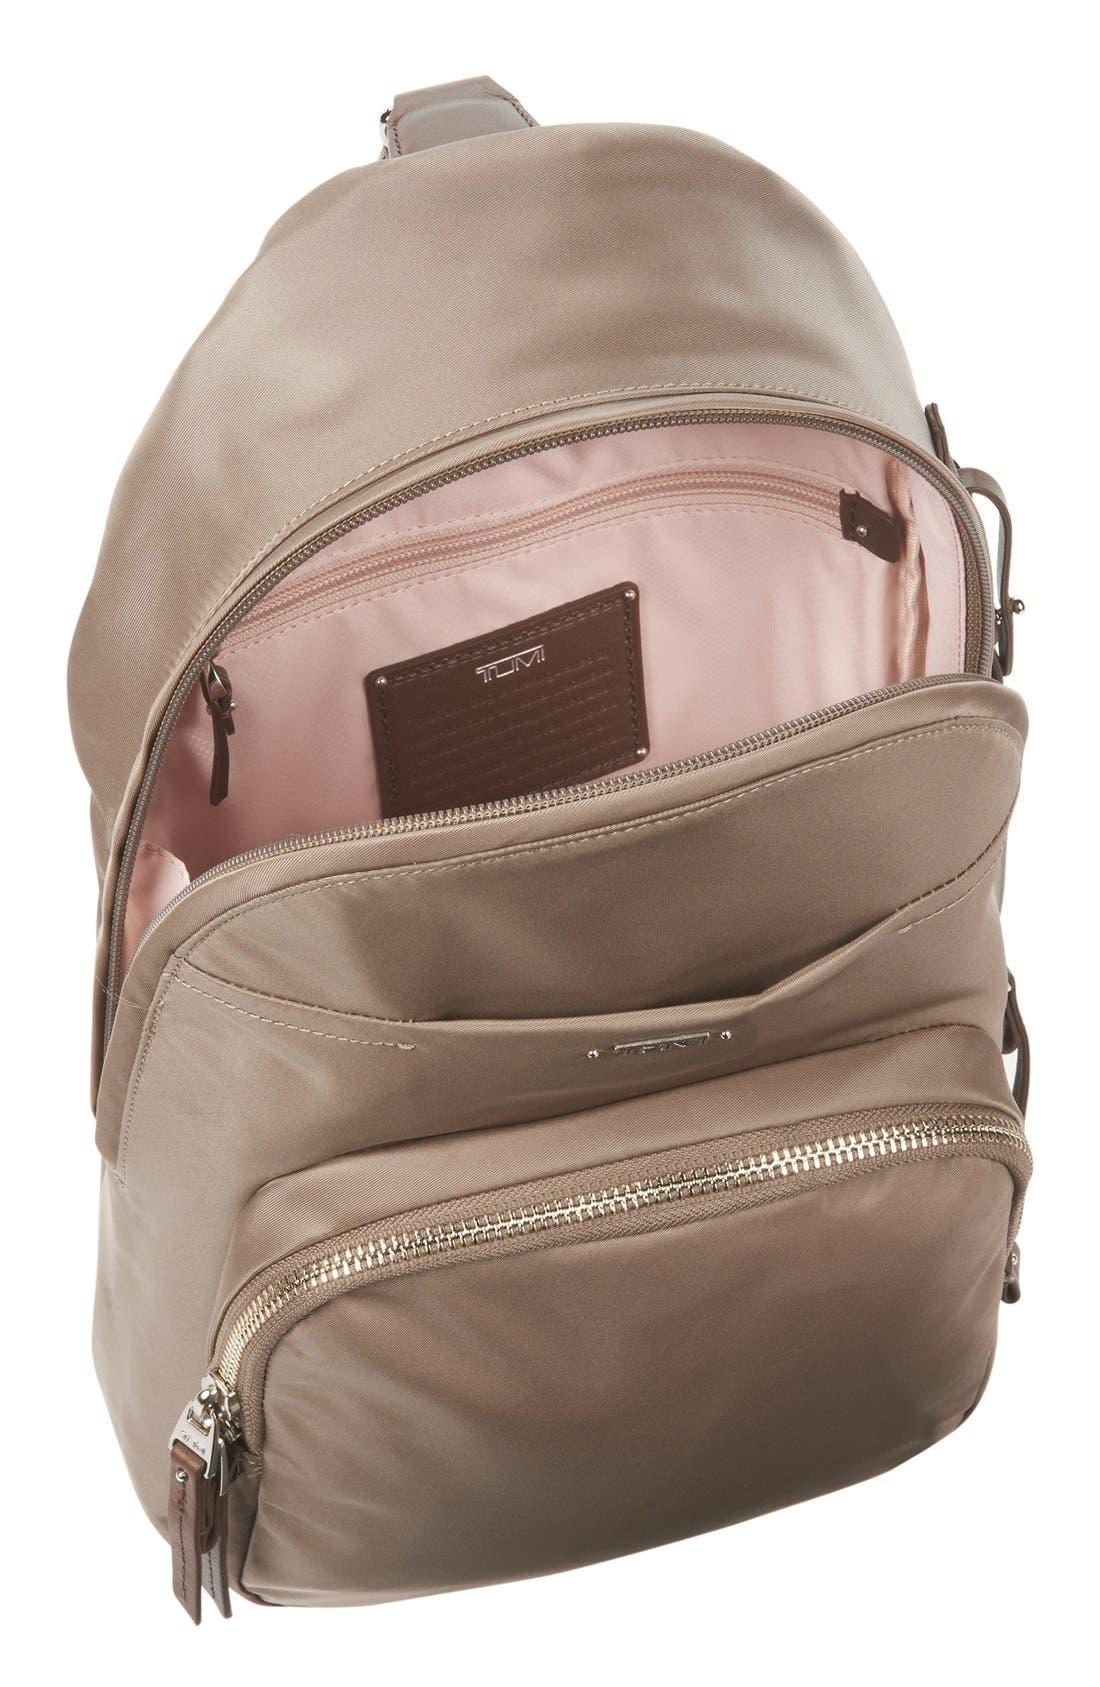 Alternate Image 3  - Tumi 'Brive' Sling Backpack